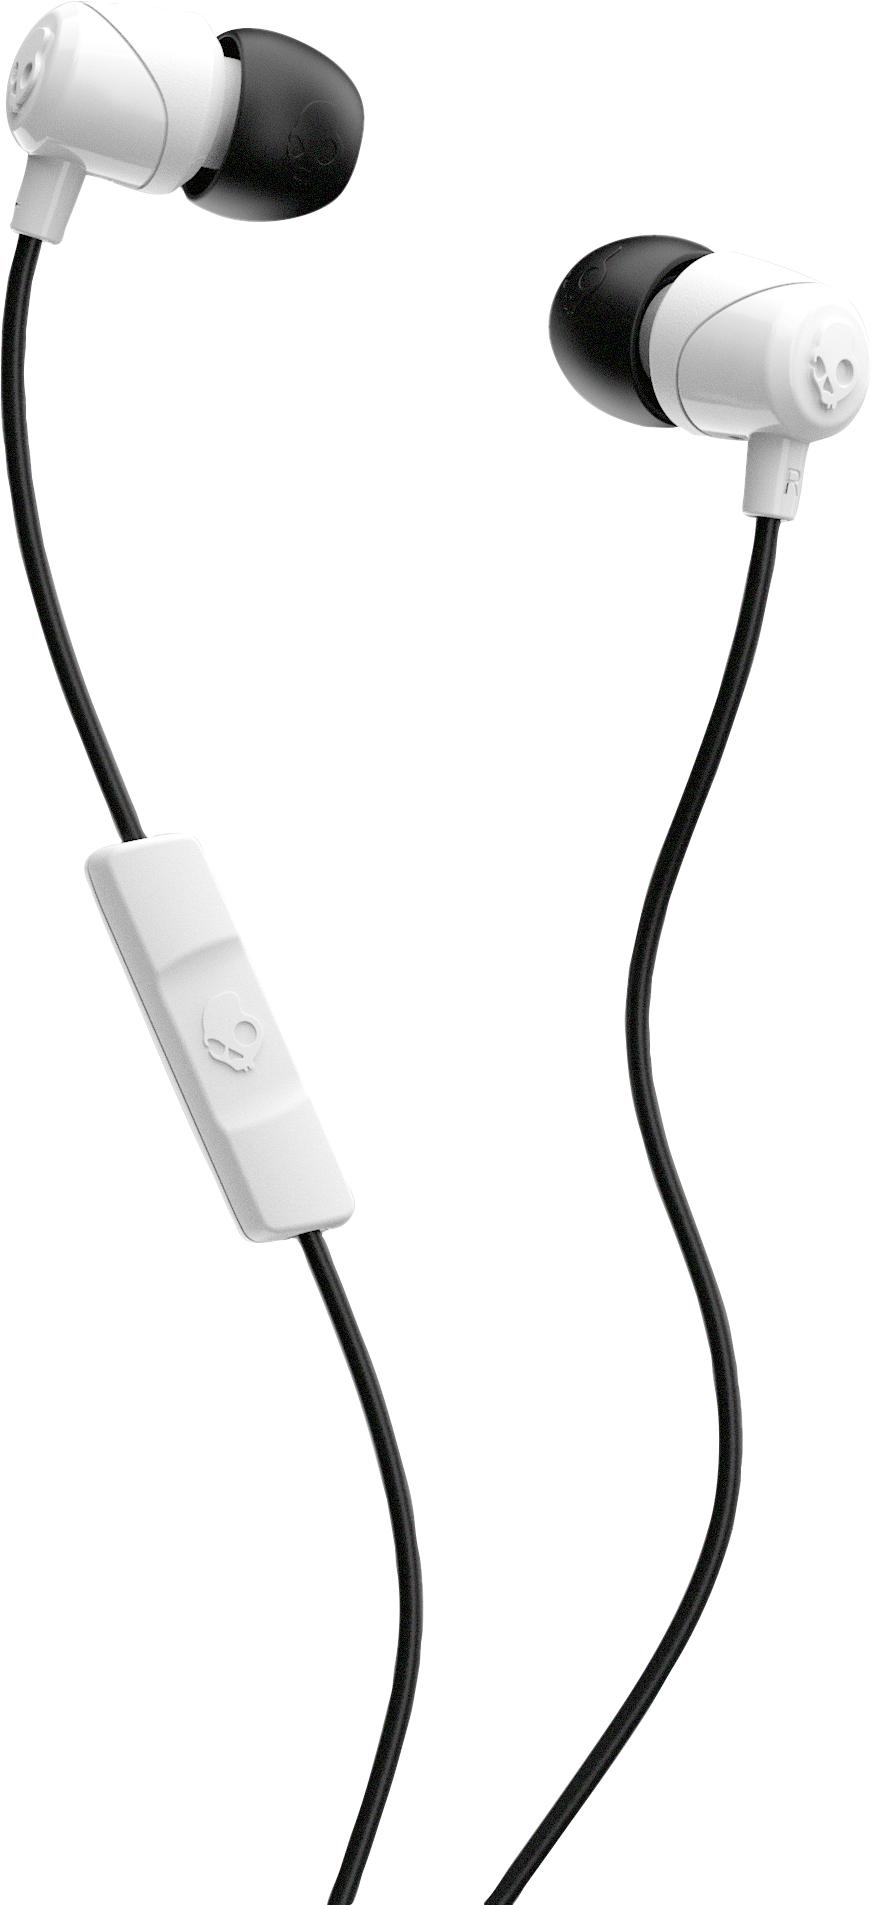 Skullcandy Jib In-Ear Earbuds with Mic - White-Black 1Pk BP